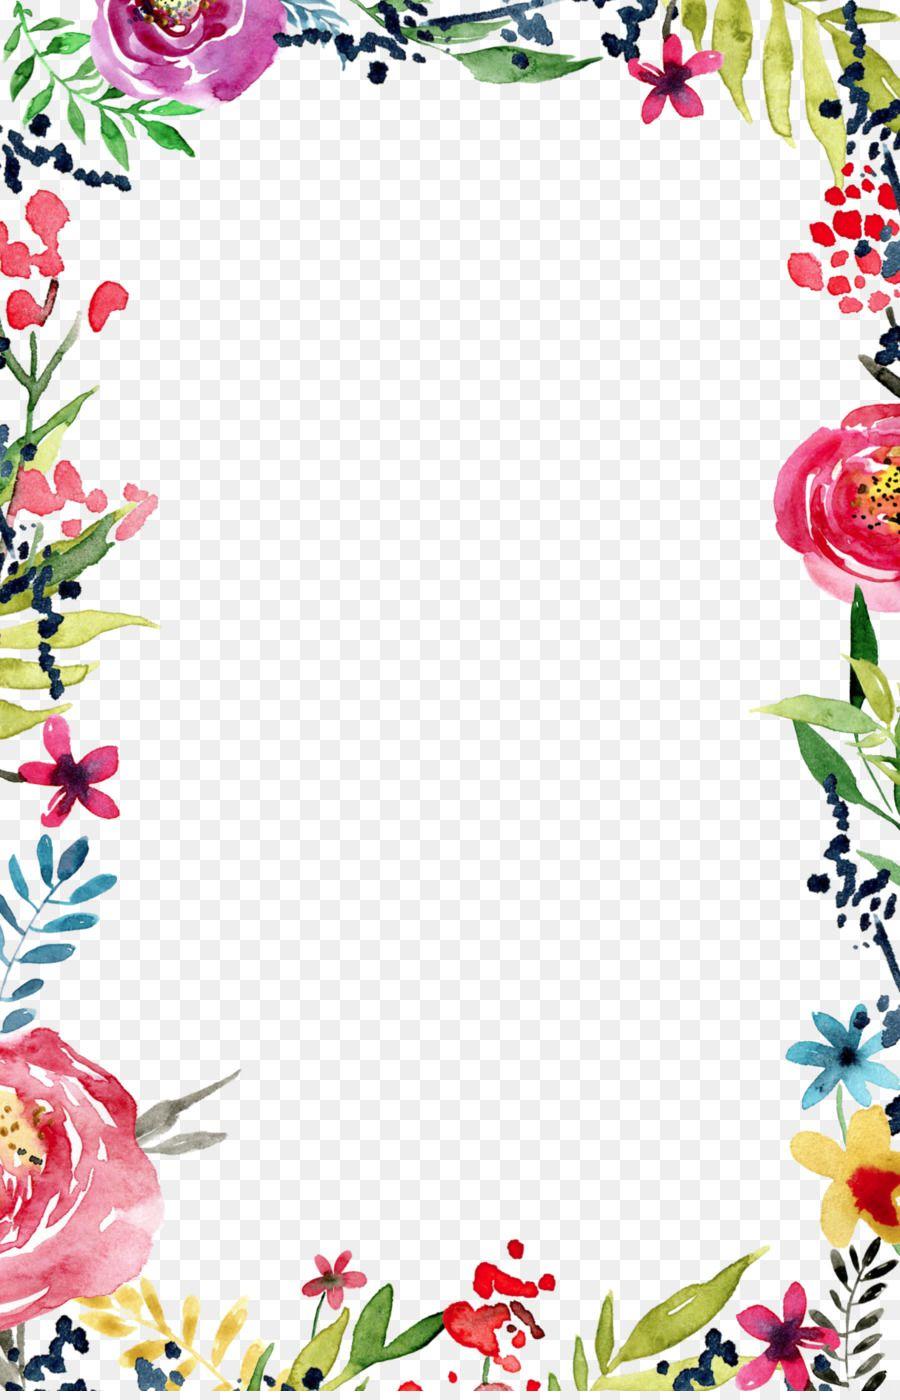 Wedding Invitation Flower Borders And Frames Template Clip Art Wedding Invitation Unlimited Download Flower Border Floral Border Design Flower Invitation